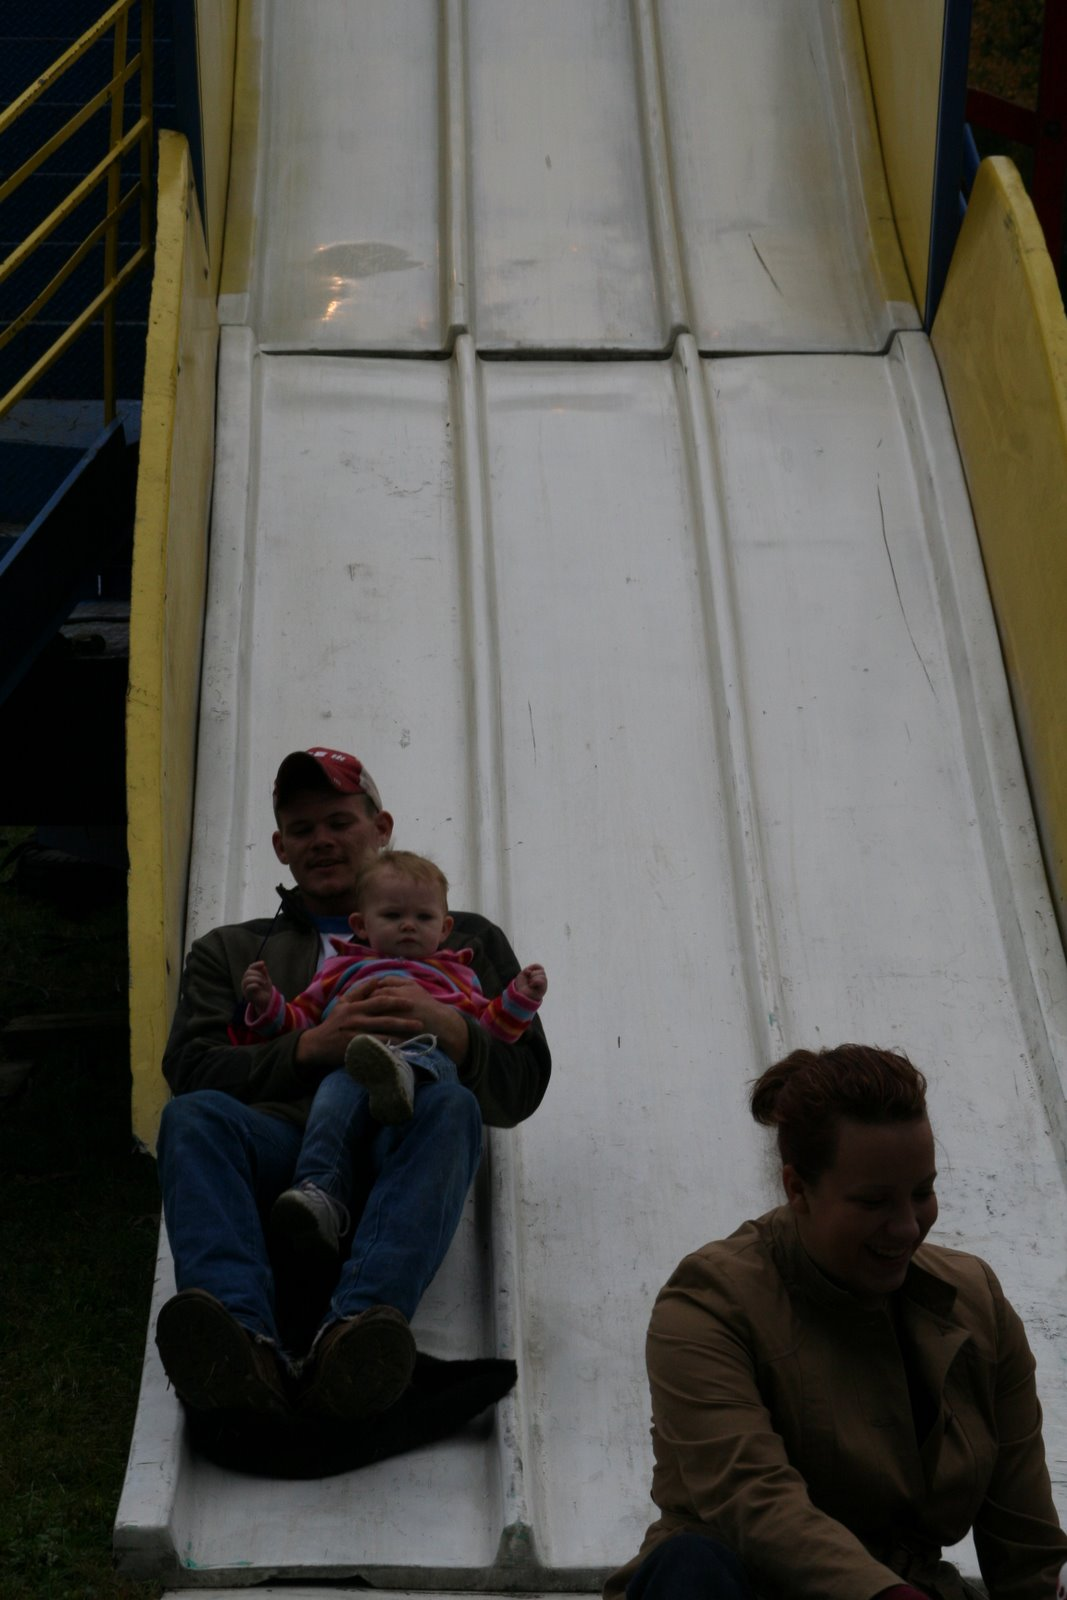 carnival-rides-49